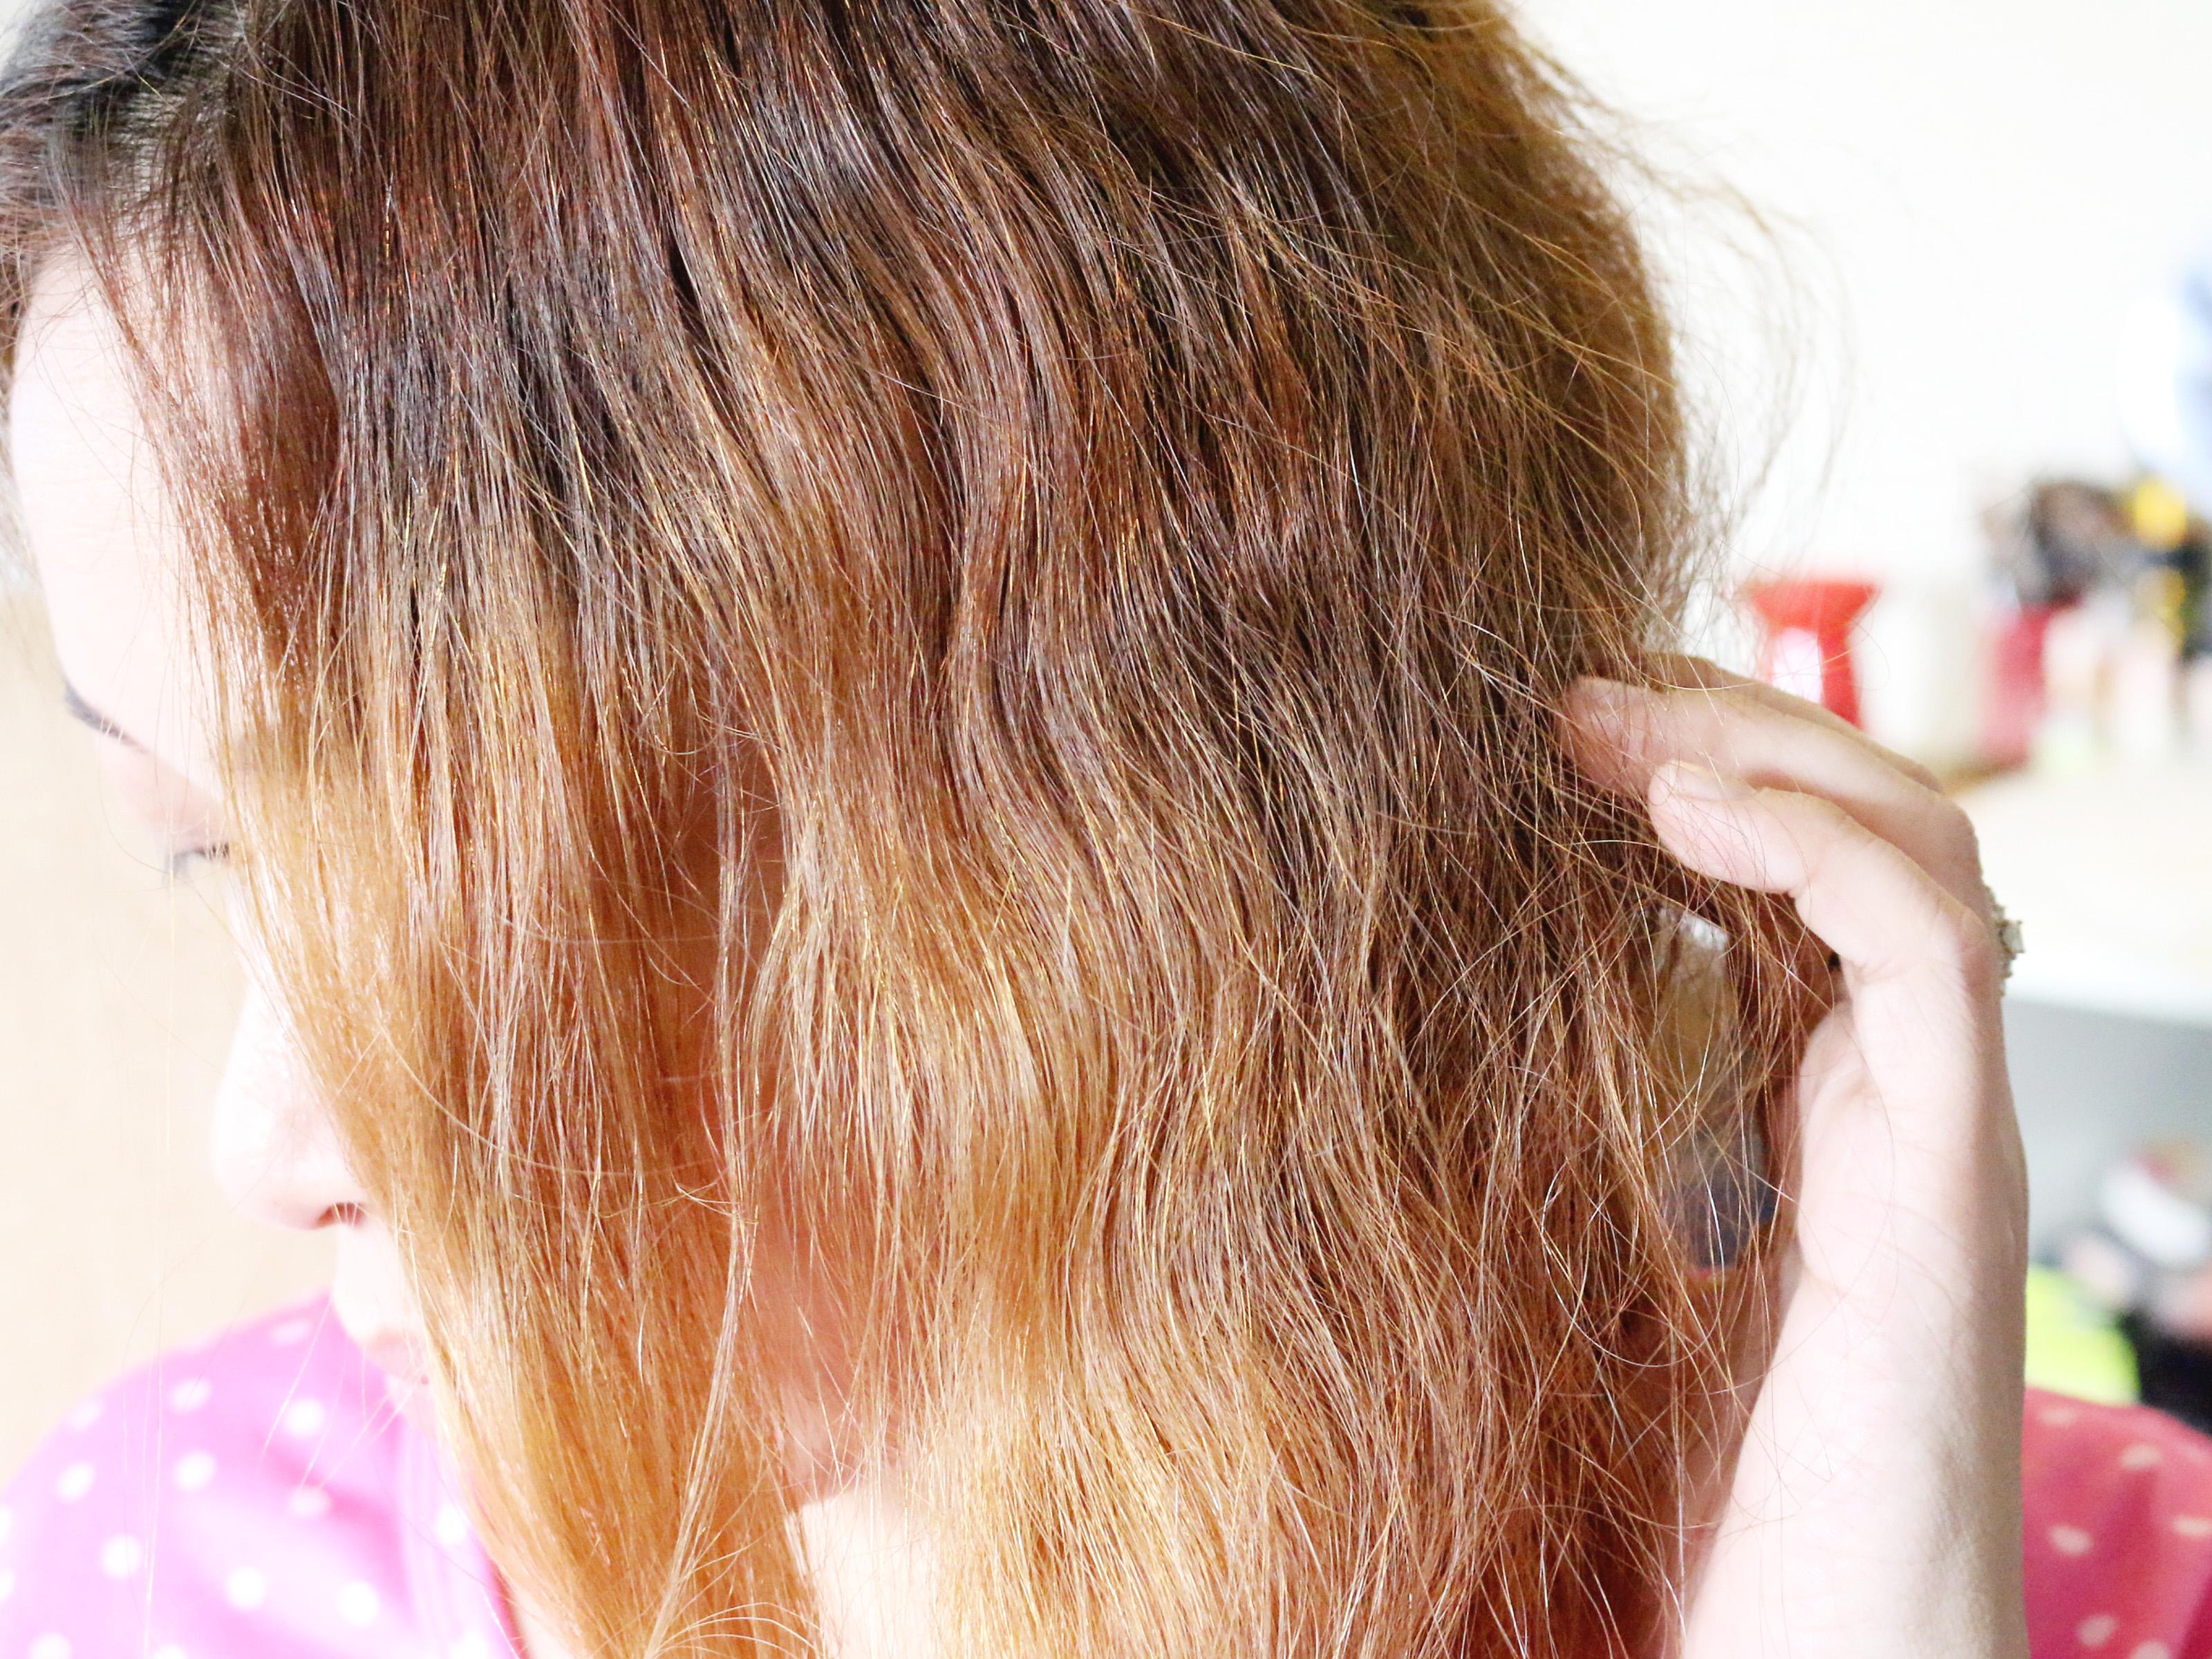 3 Ways to Frizz Your Hair wikiHow